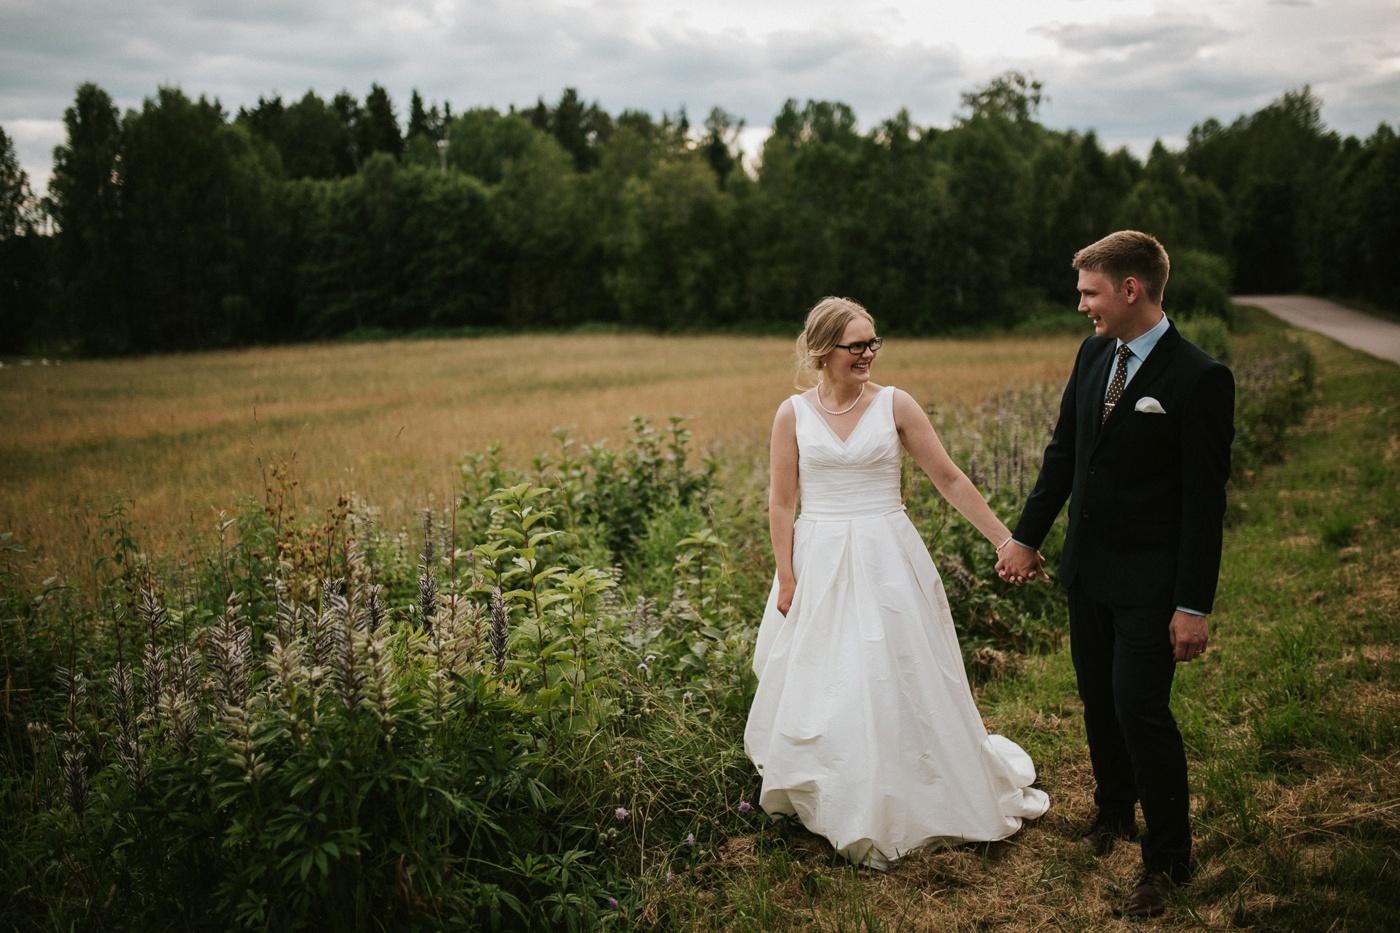 ceciliajoakim_sweden-countryside-summer-wedding_melbourne-fun-quirky-wedding-photography_92